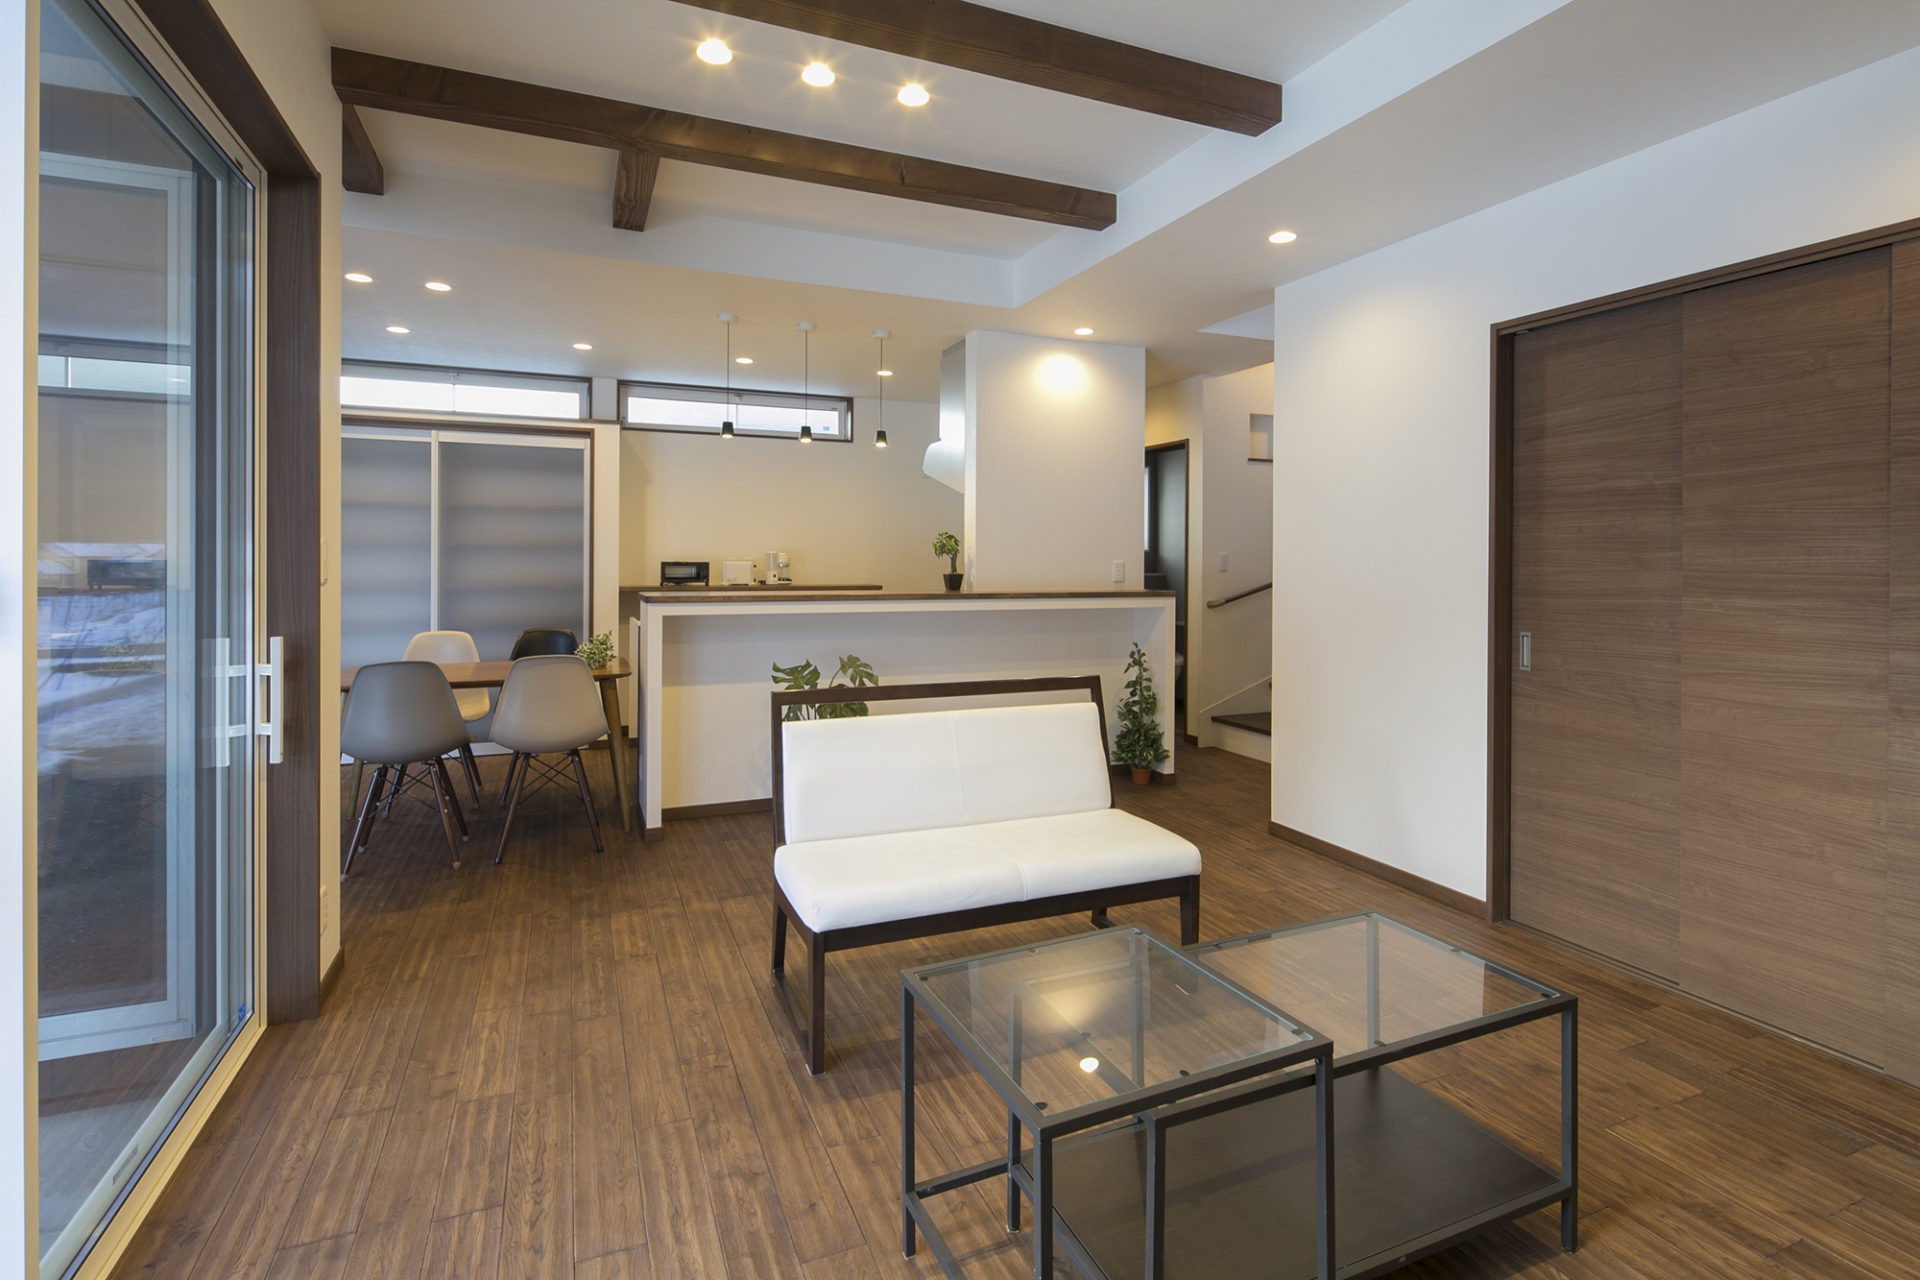 Shiawaseya-落ち着いた空間と藤色のキッチンが優しい時間を刻む家